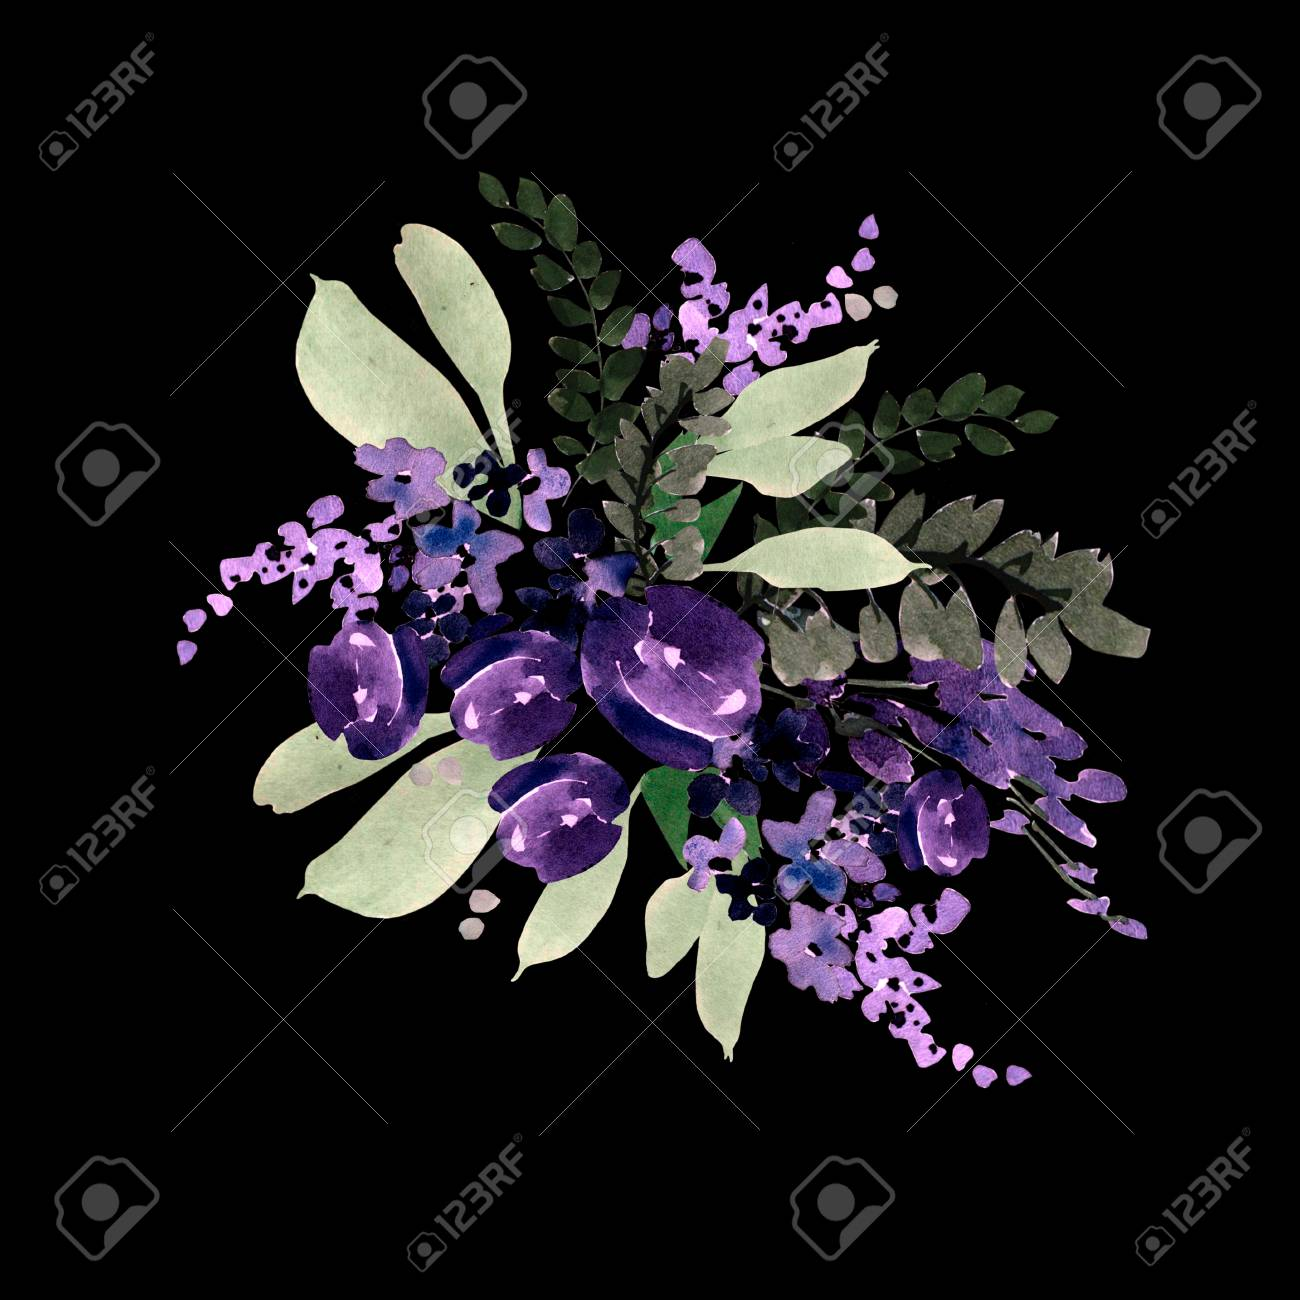 Beautiful watercolor wedding bouquet with purple flowers beautiful watercolor wedding bouquet with purple flowers illustration stock illustration 96132464 izmirmasajfo